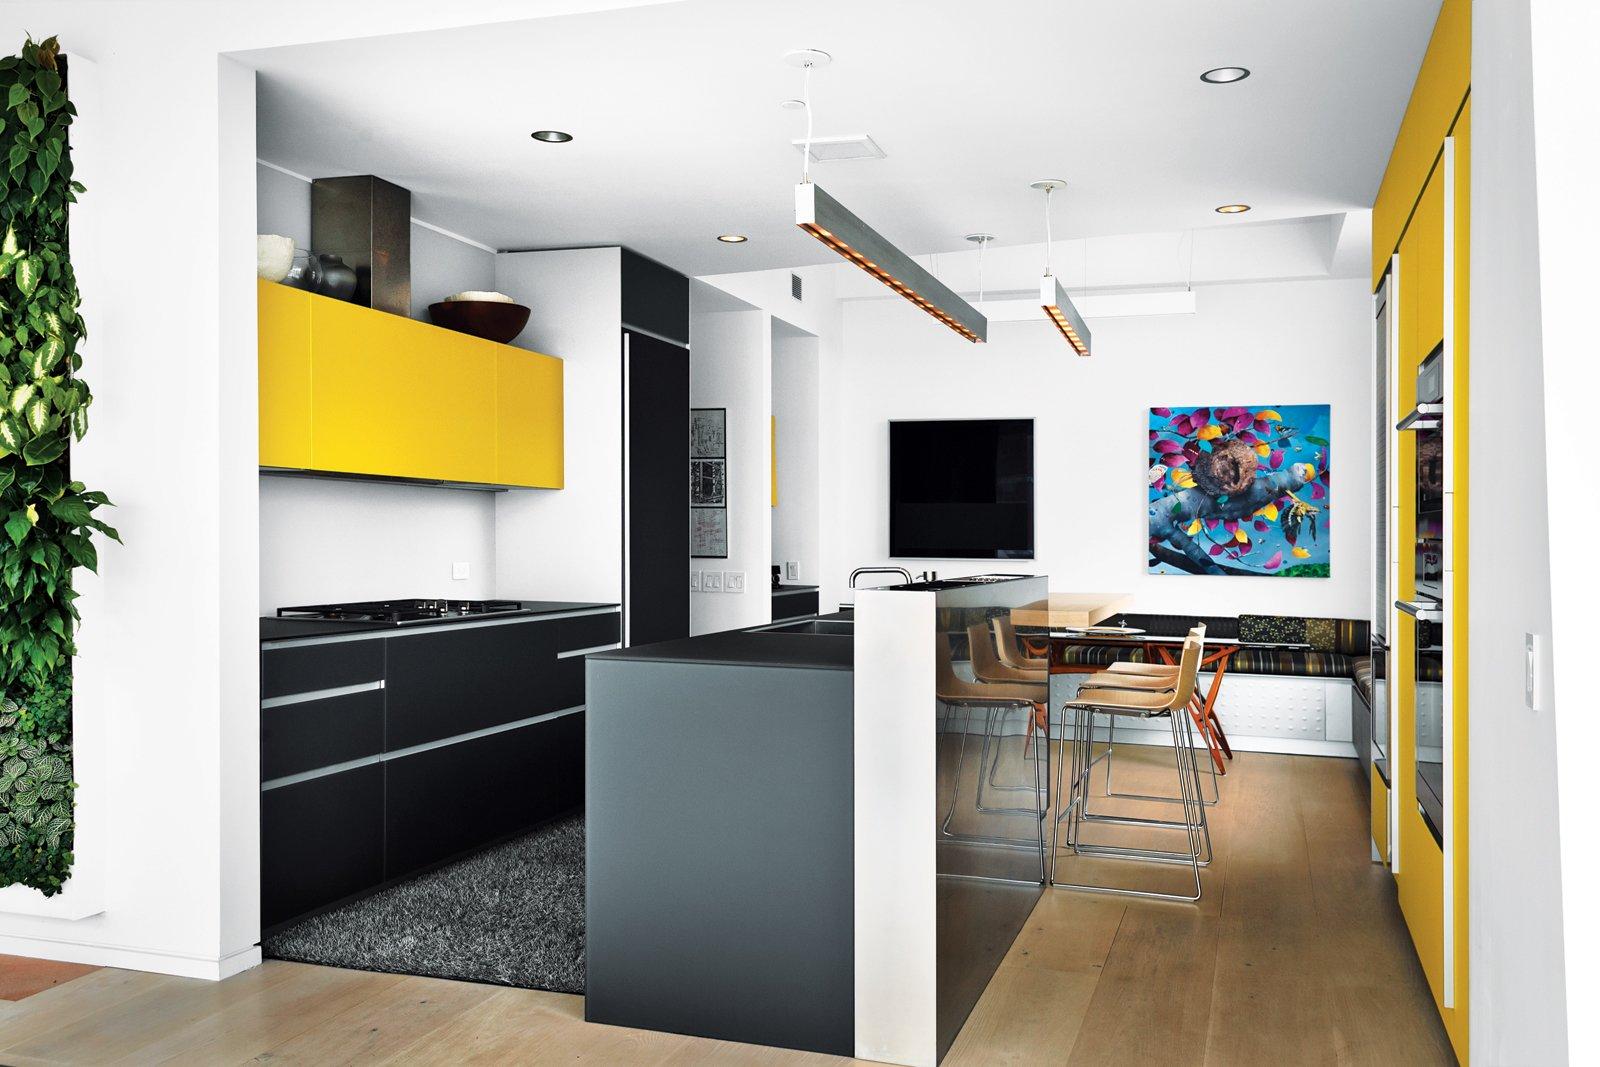 HL23 apartment kitchen